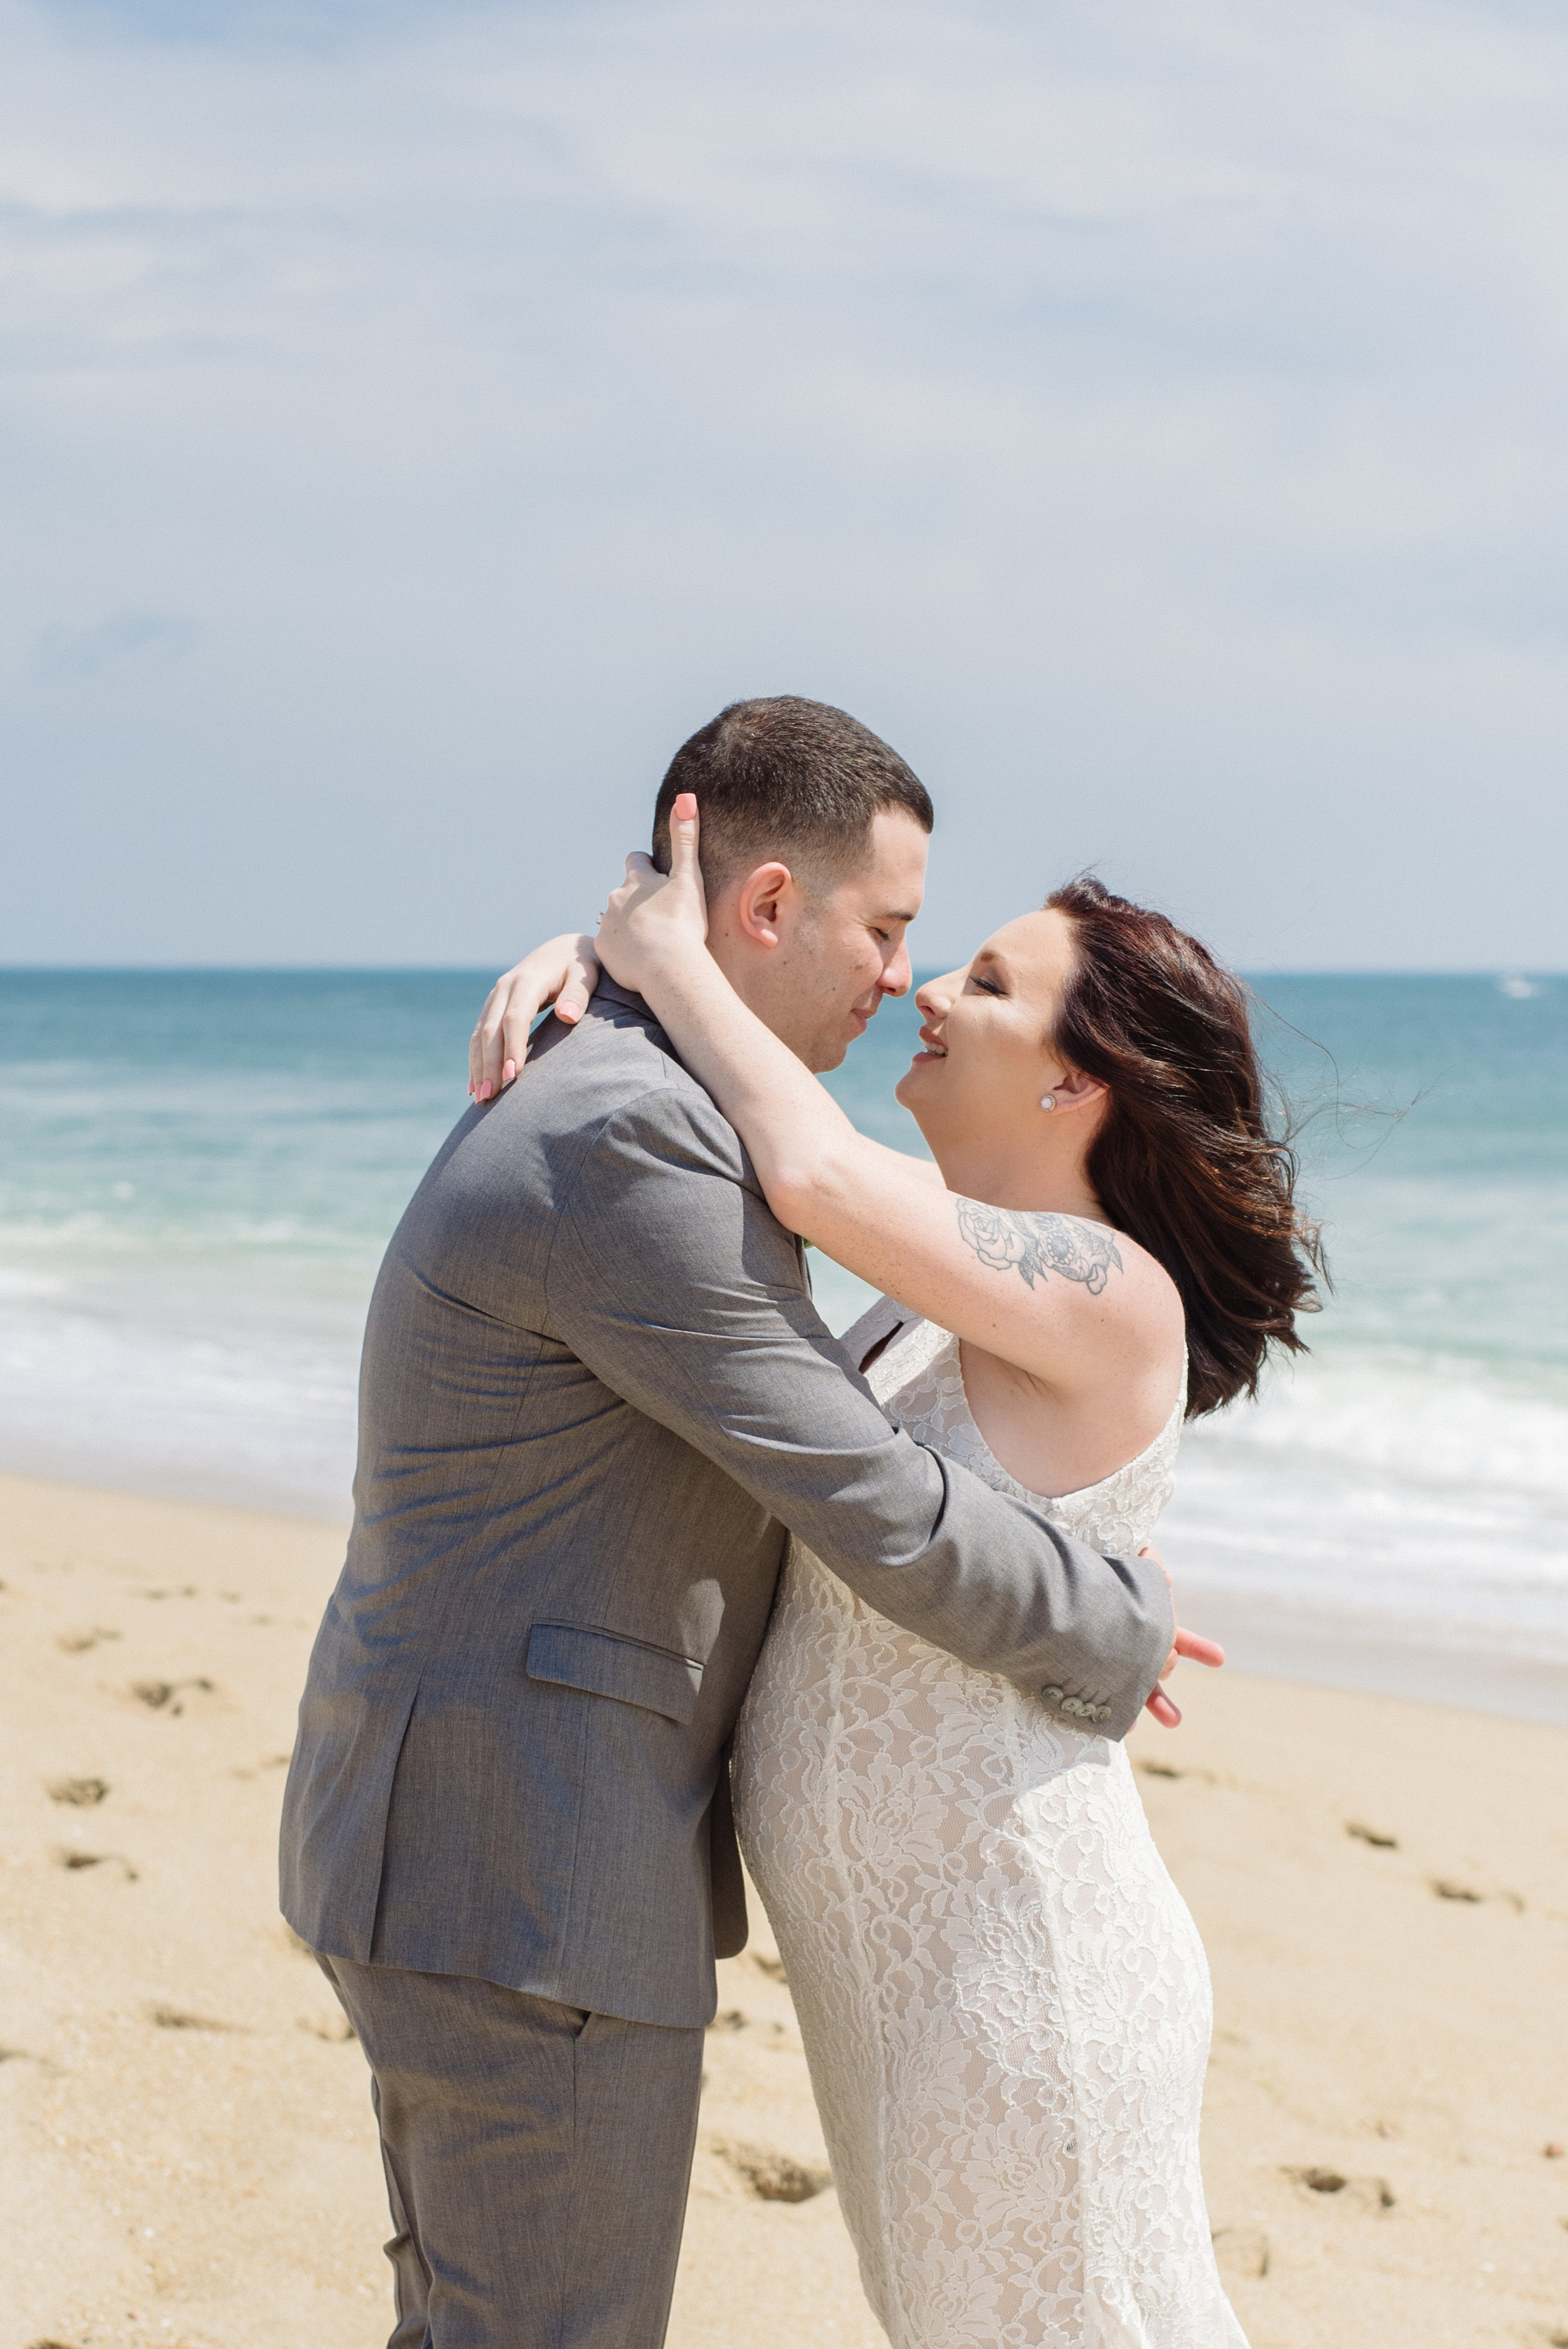 Caitlyn+Anthony- Belmar Beach Elopement- New Jersey Weddings- Olivia Christina Photo-101.JPG